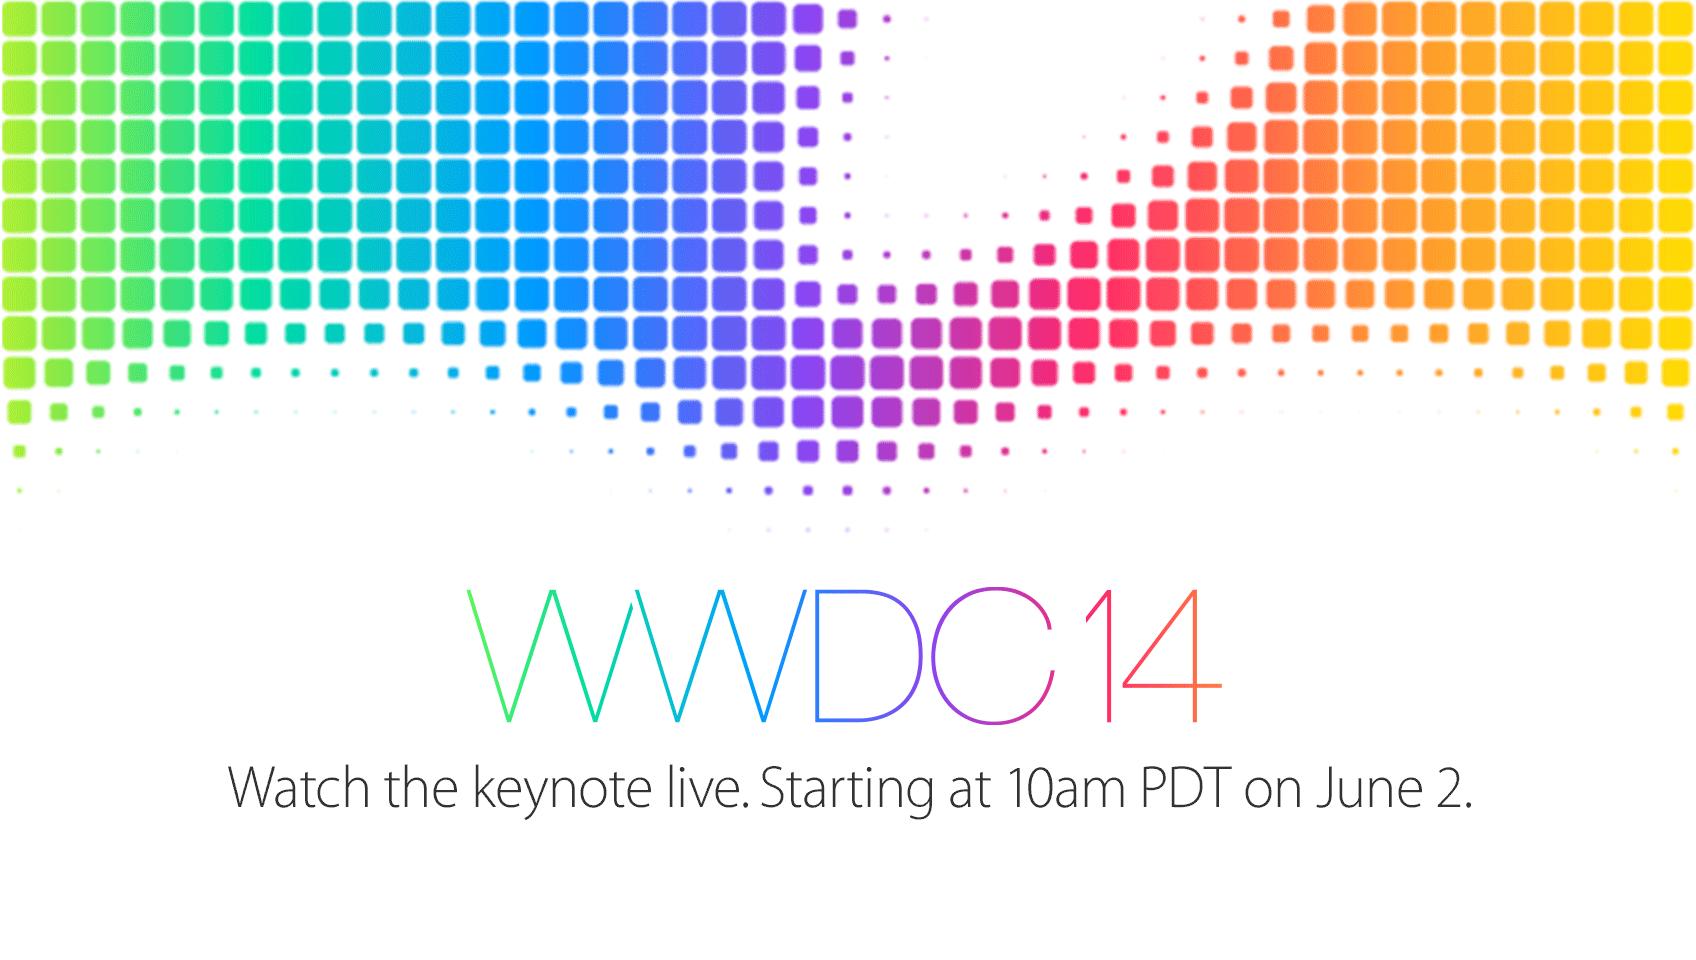 Apple to Stream WWDC 2014 Keynote on June 2